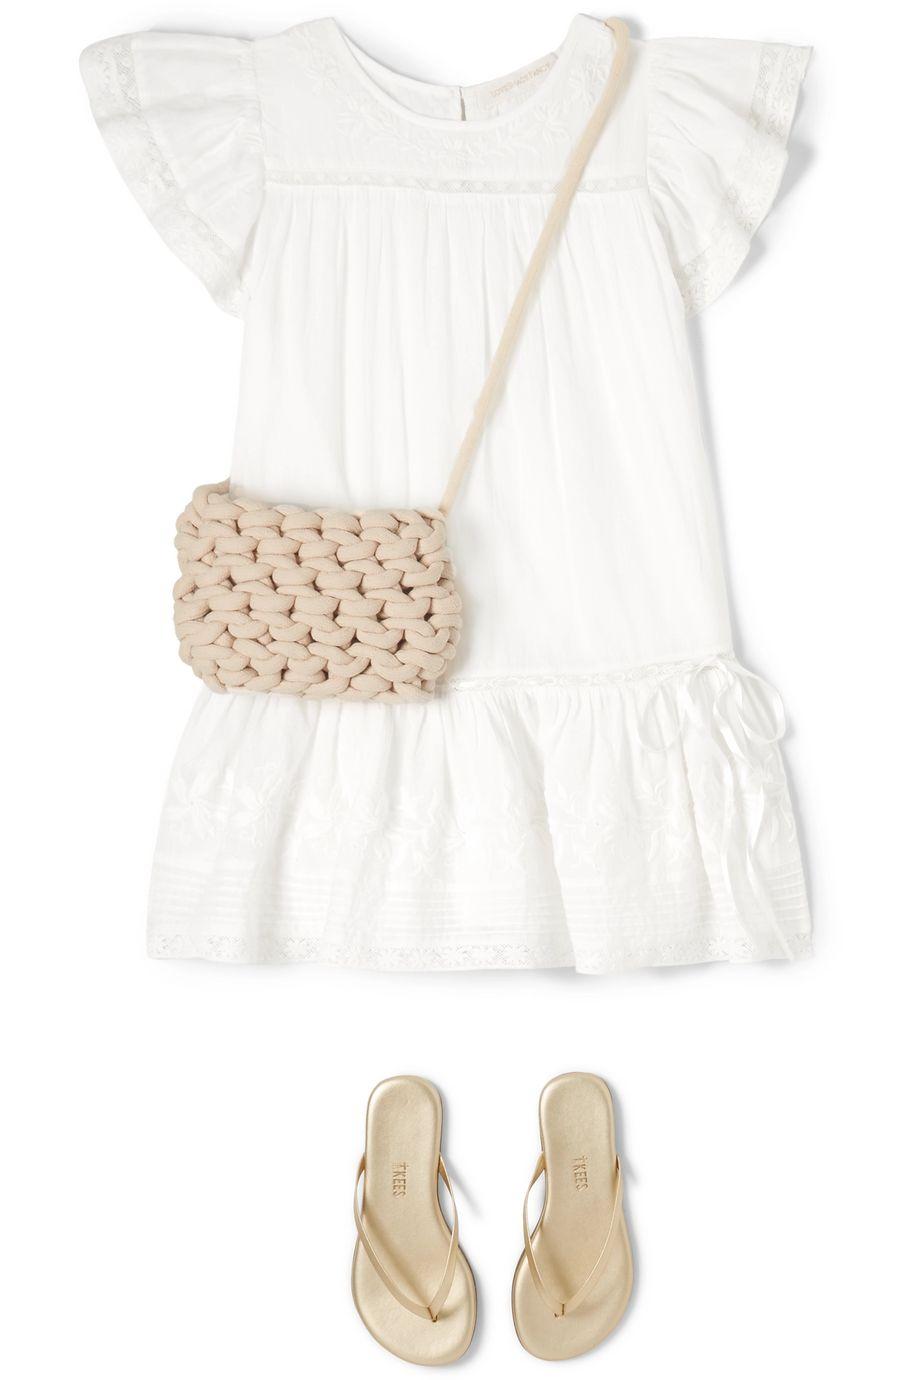 Alienina Kids Woven cotton shoulder bag